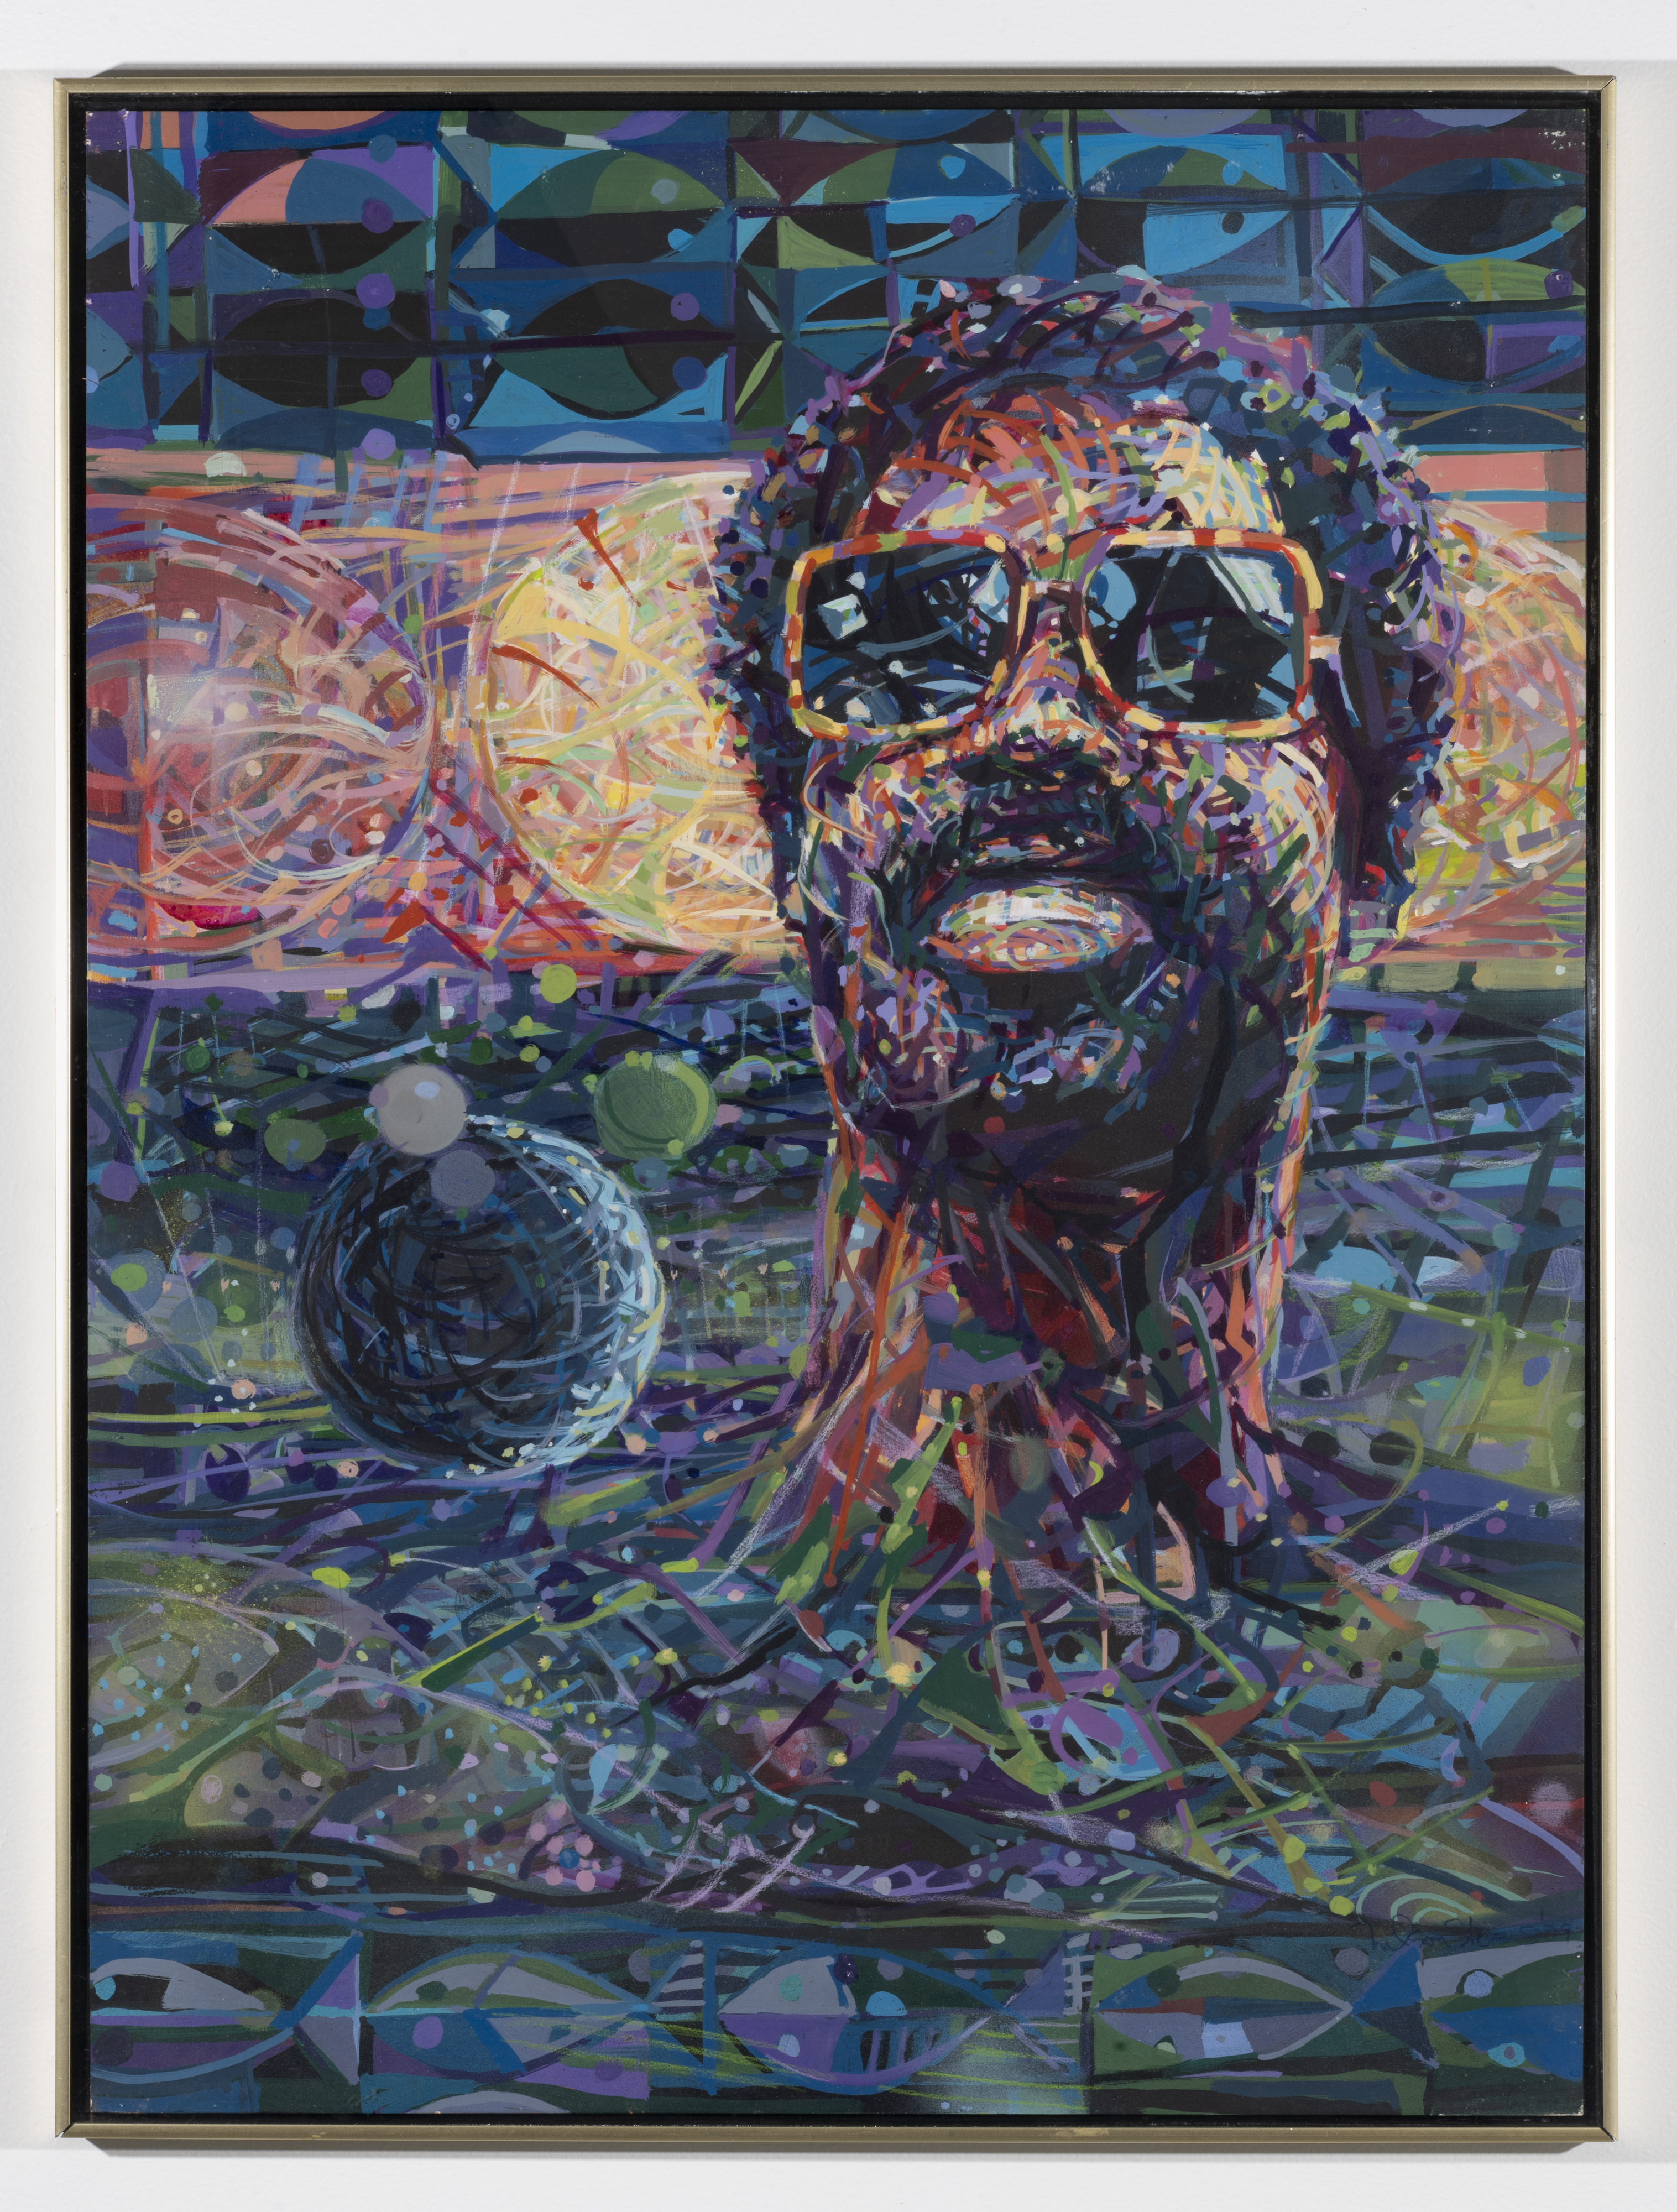 8th Wonder of the World, 1982